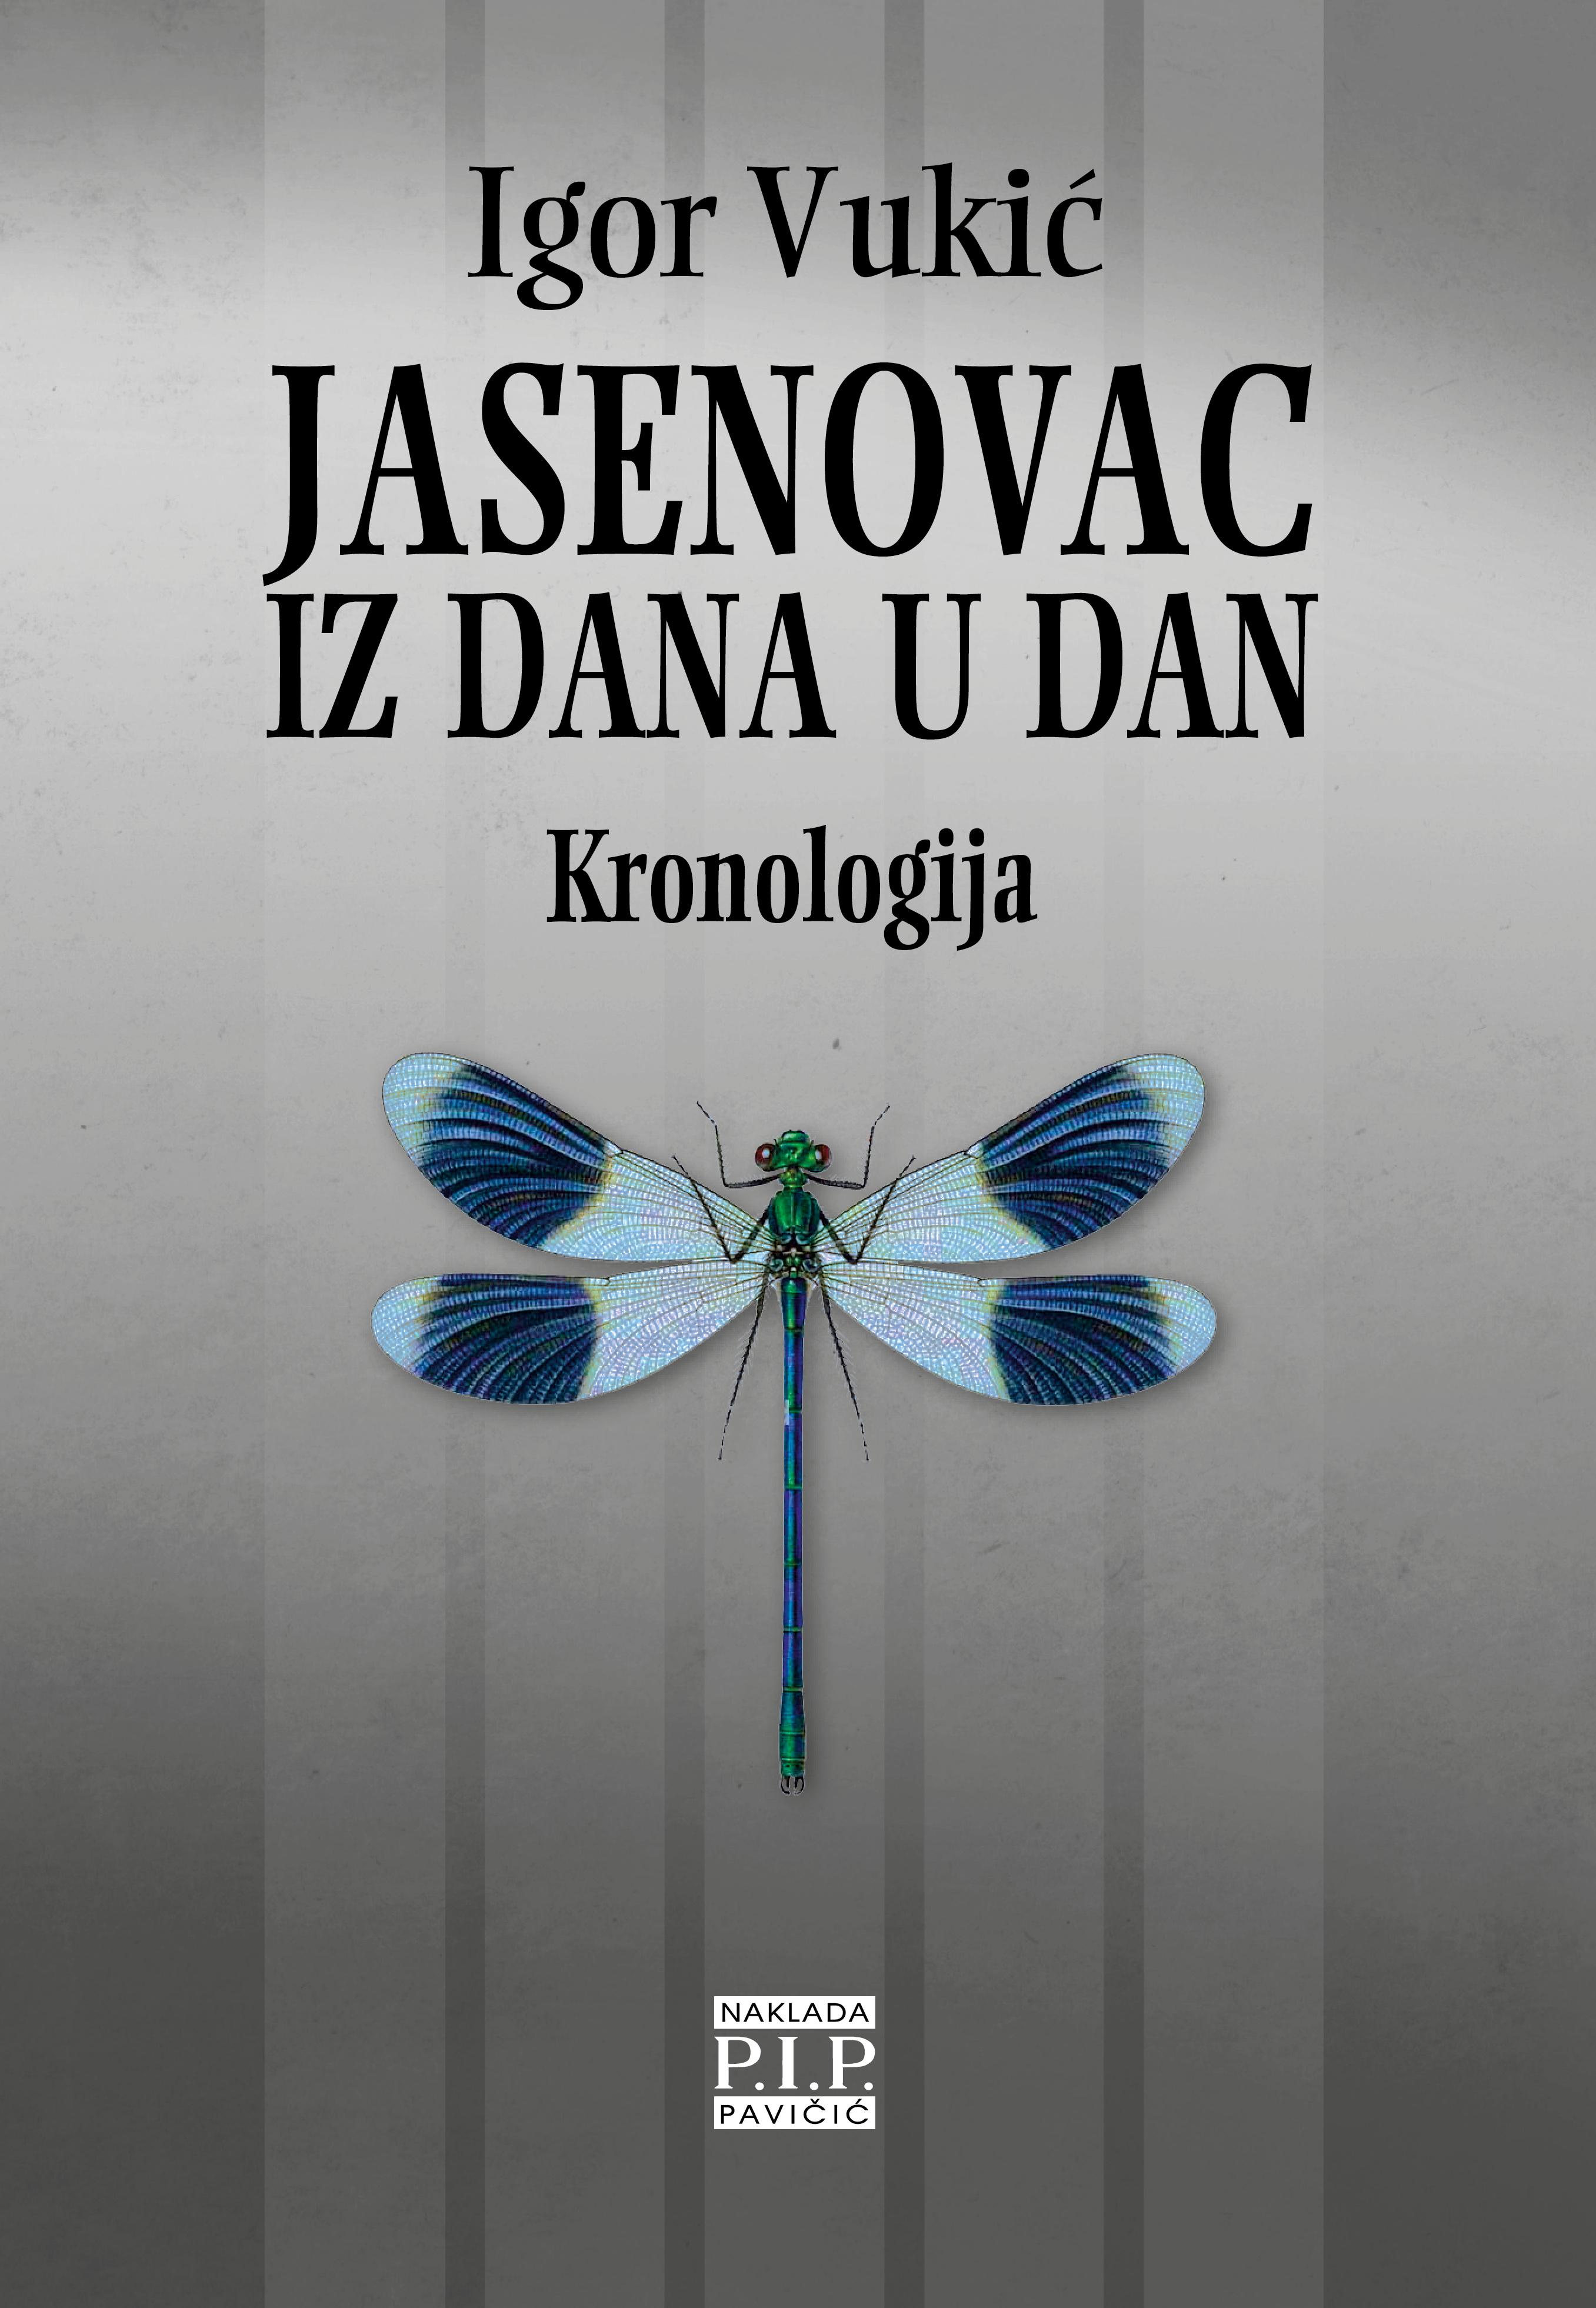 jasenovac kronologija omot final